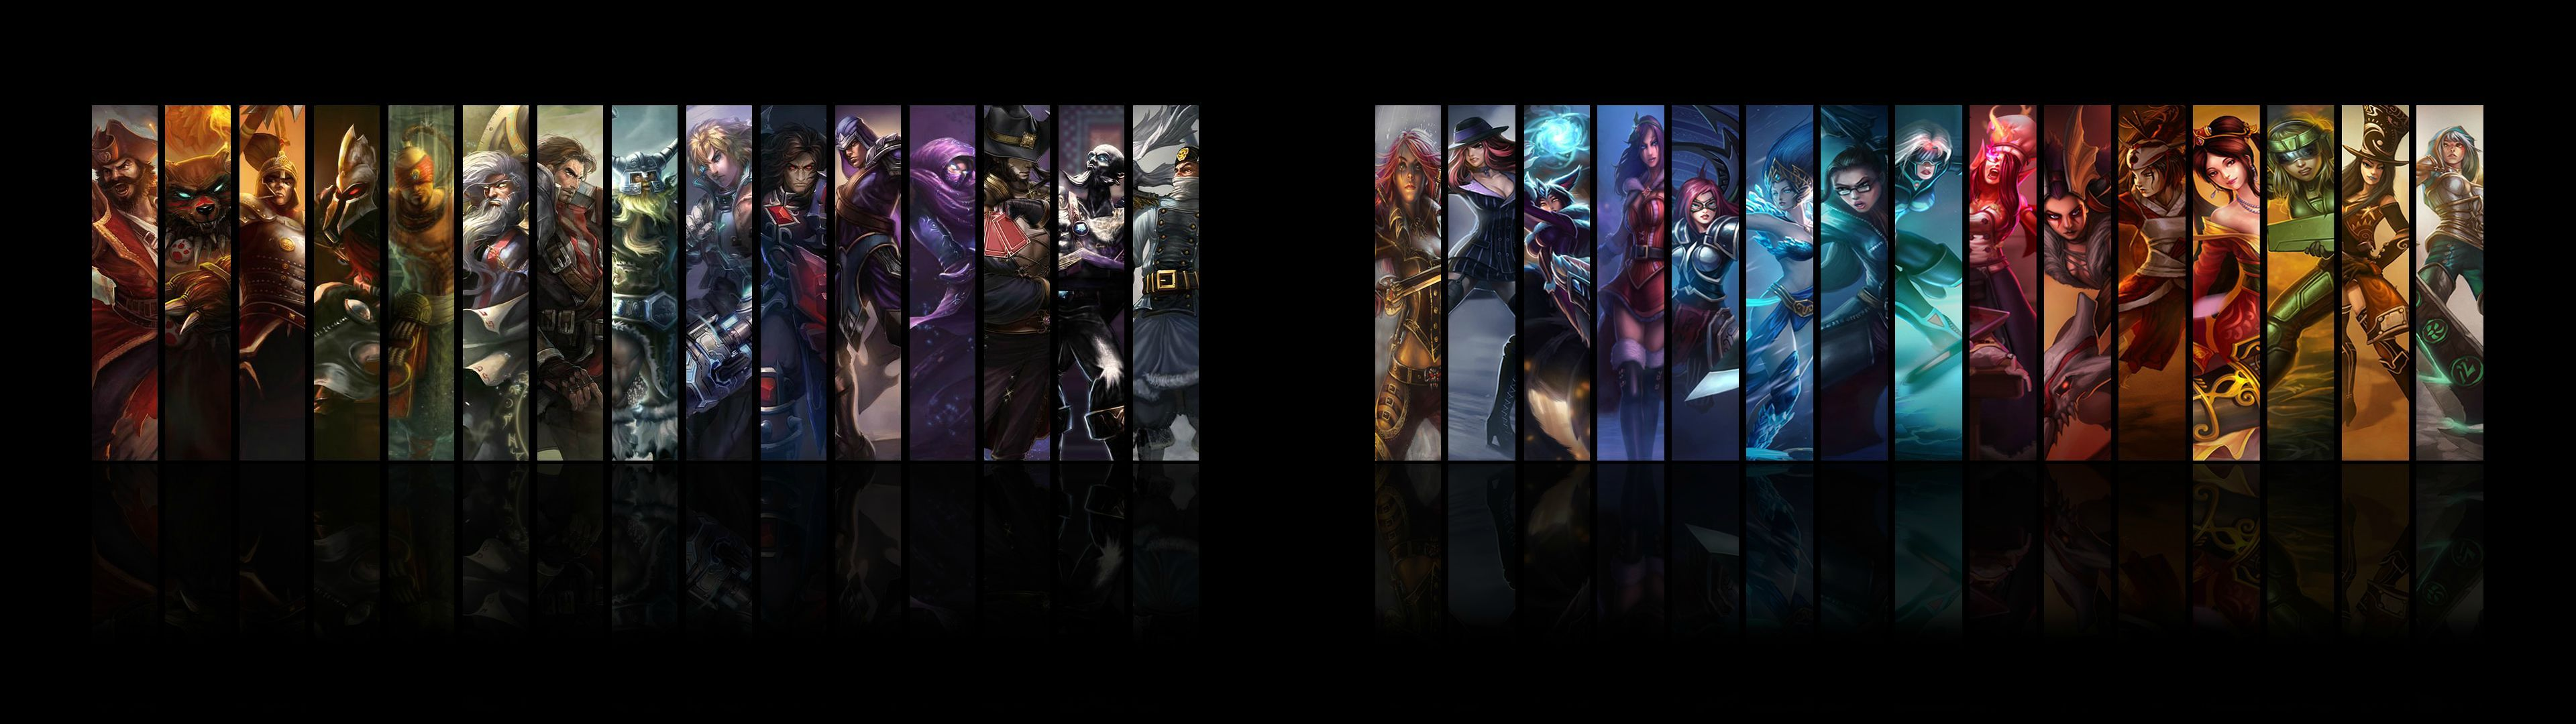 Dual Monitor Wallpaper League Of Legends Download Dual monitor 3840x1080